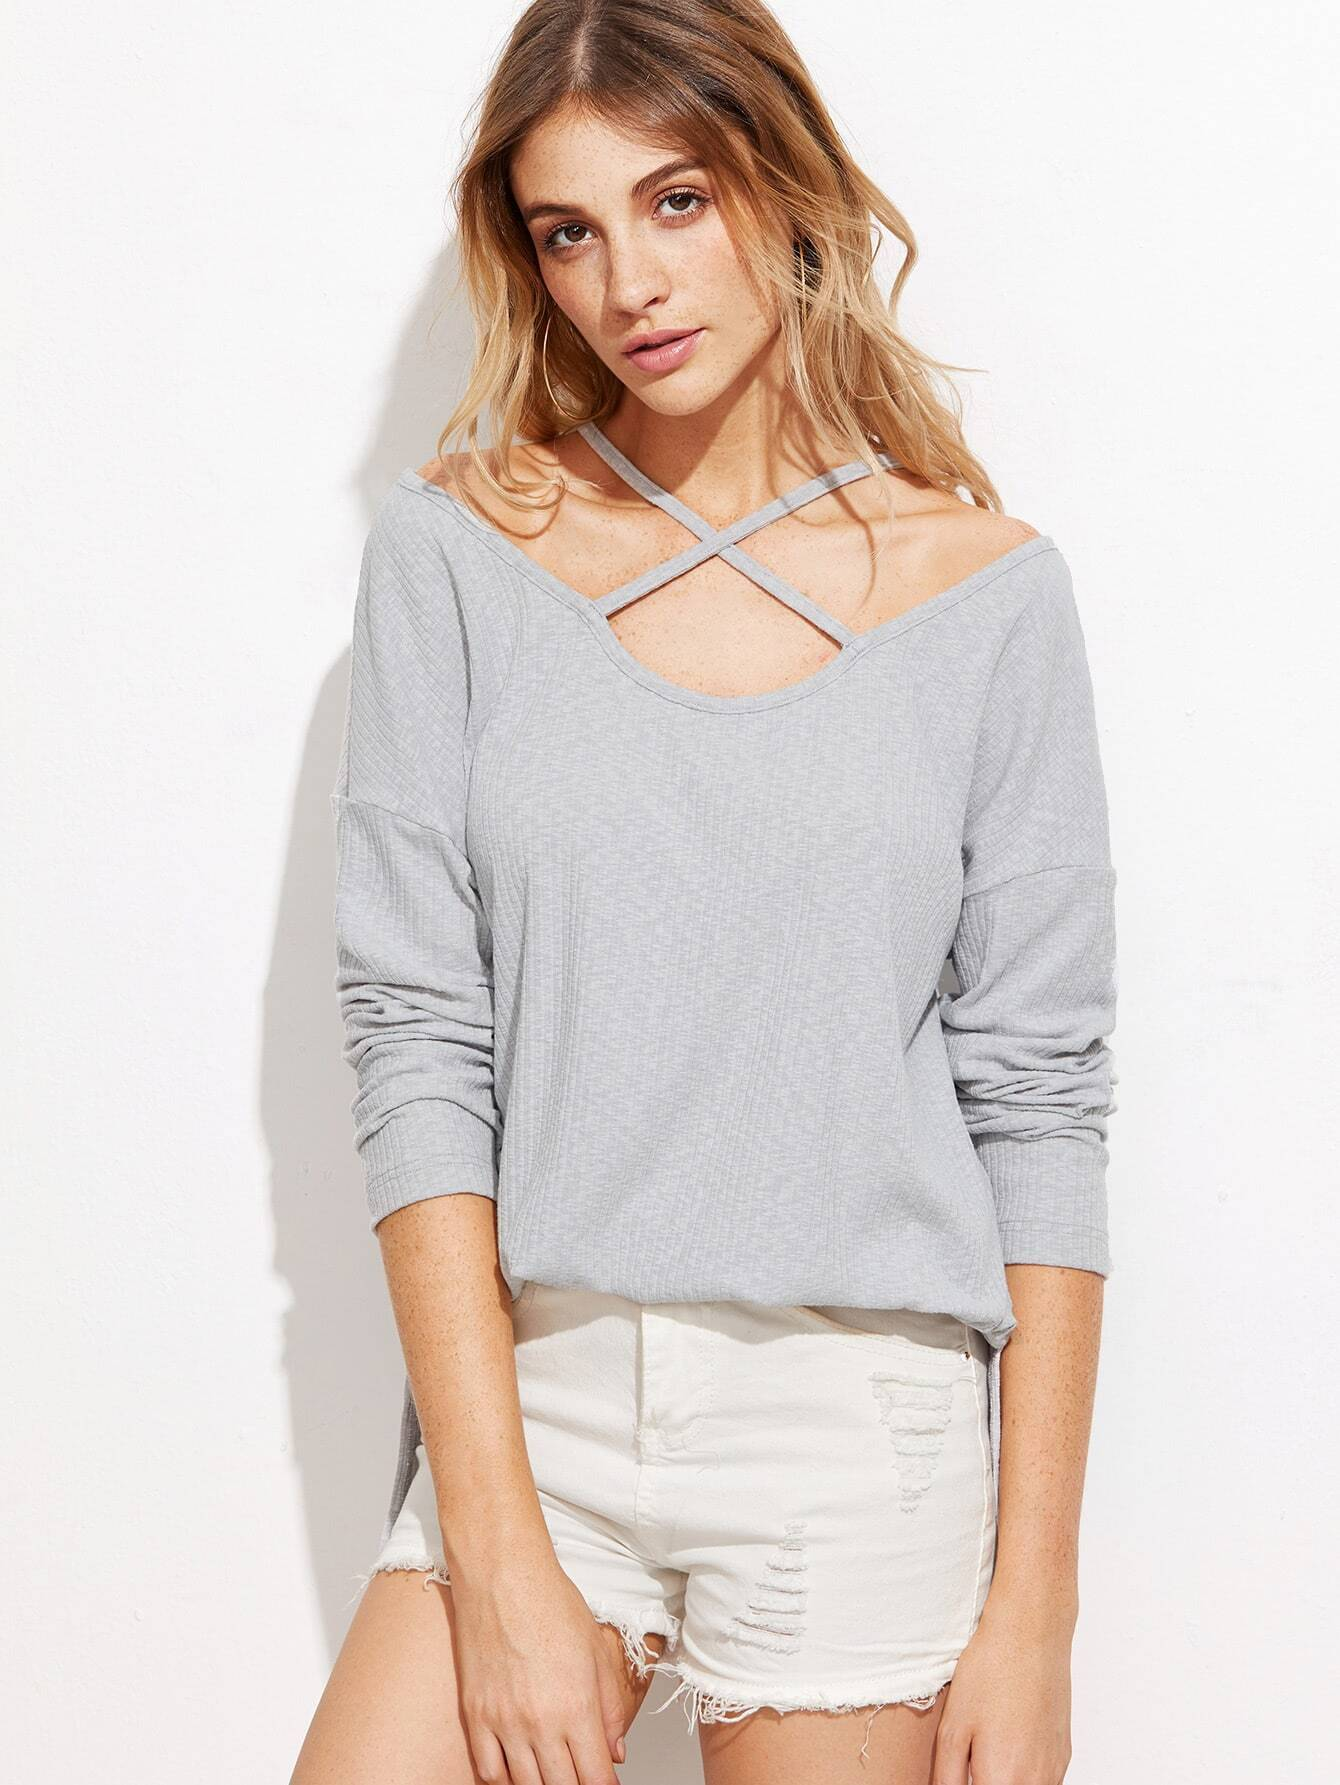 Heather Grey Ribbed Crisscross Cold Shoulder T-shirt